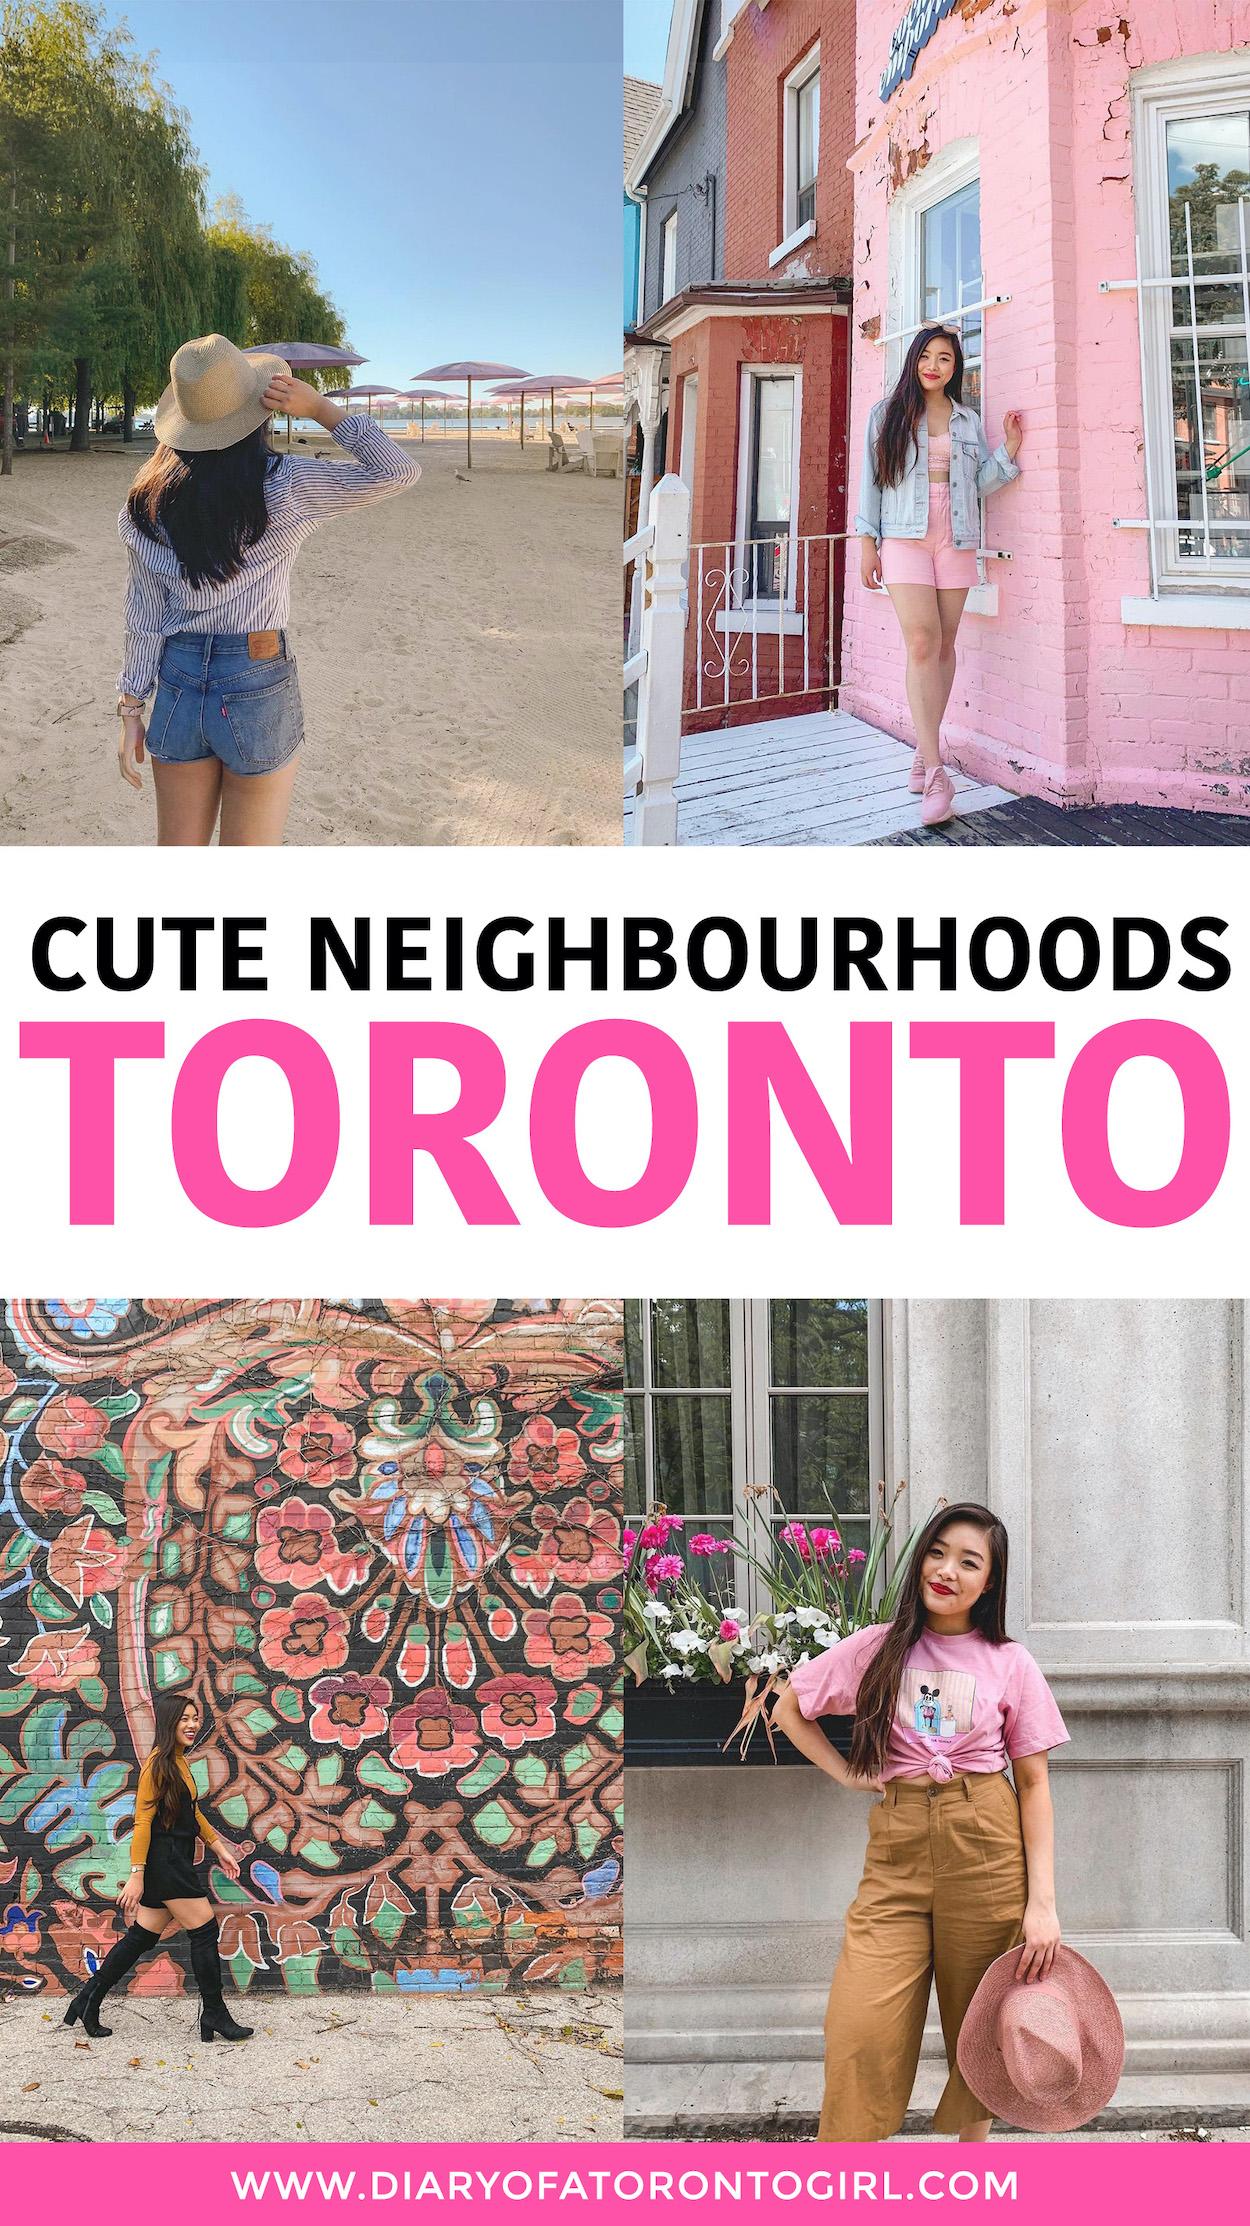 Cute Toronto neighbourhoods